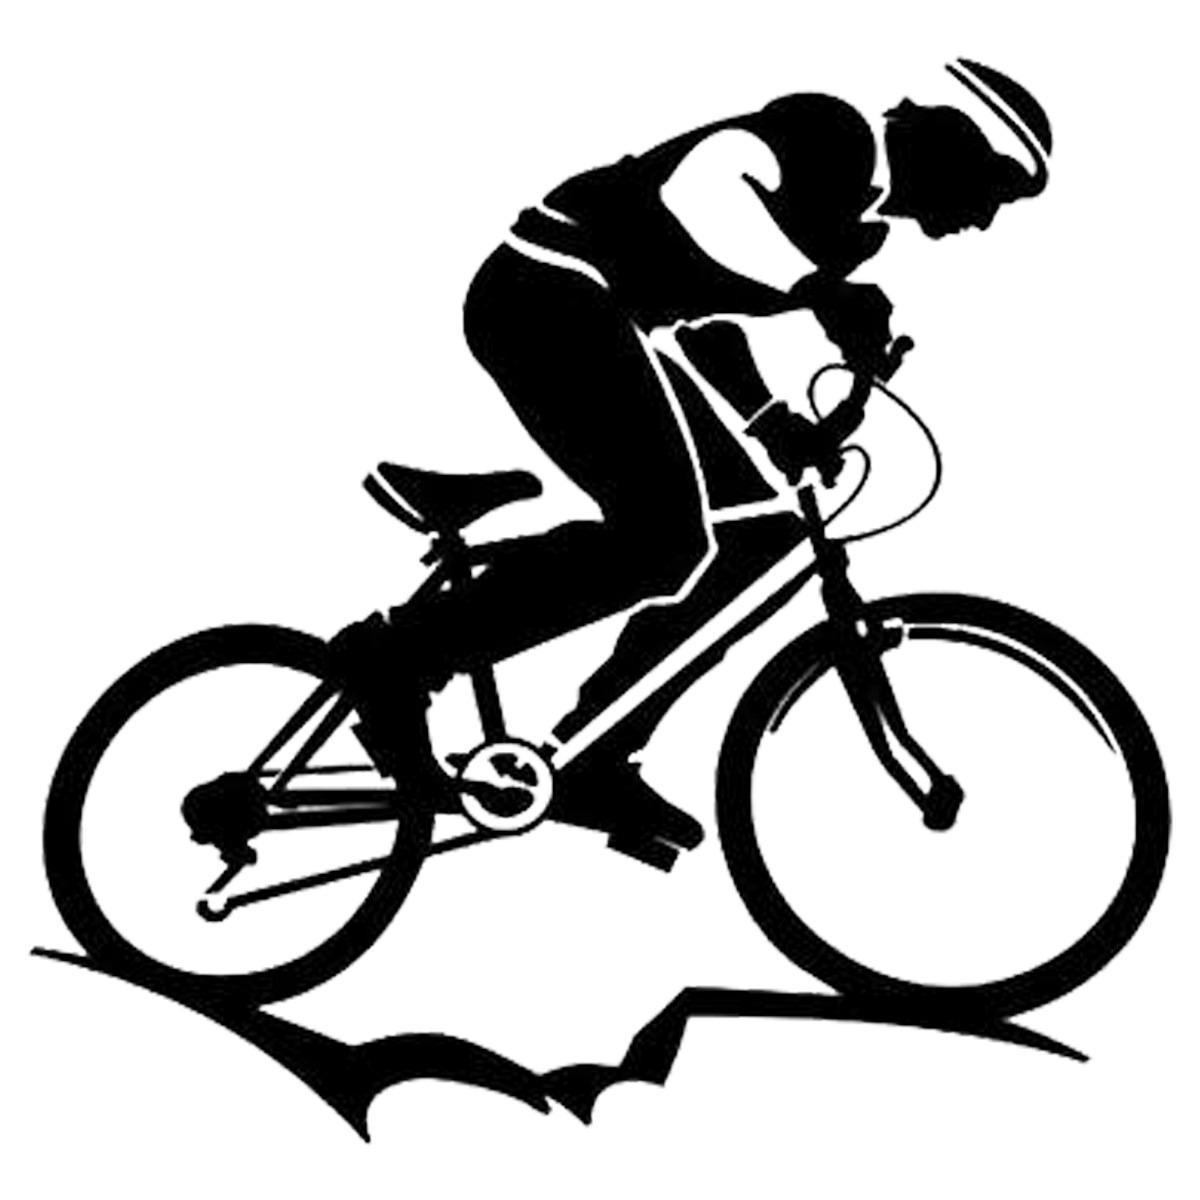 Adesivo Decorativo Ciclismo Mountain Bike Esportes 16cm